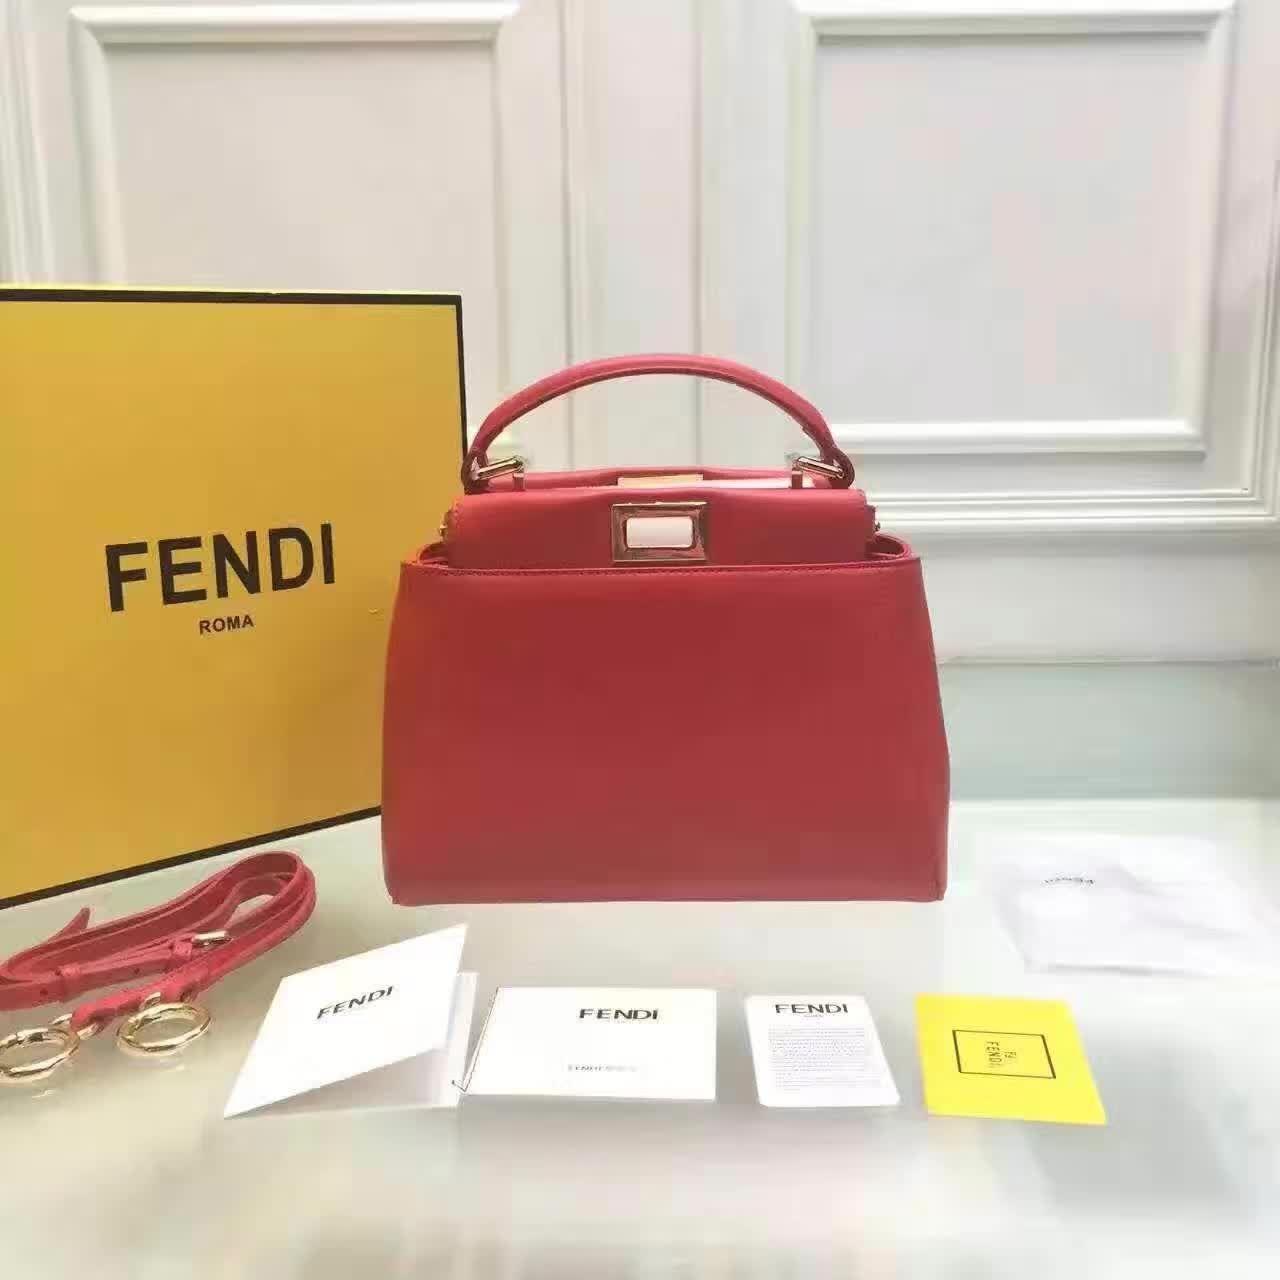 fendi Bag, ID : 64818(FORSALE:a@yybags.com), fendi ladies leather handbags, fendi backpack for laptop, fendi designer leather bags, fendi flats, fendi satchel handbags, fendi it, fendi bags 2016 prices, fendi unique backpacks, fendi handbags 2016, findi bags, fendi shoes womens, adele fendi bag, fendi ostrich handbags, 2016 fendi #fendiBag #fendi #fendi #fendi